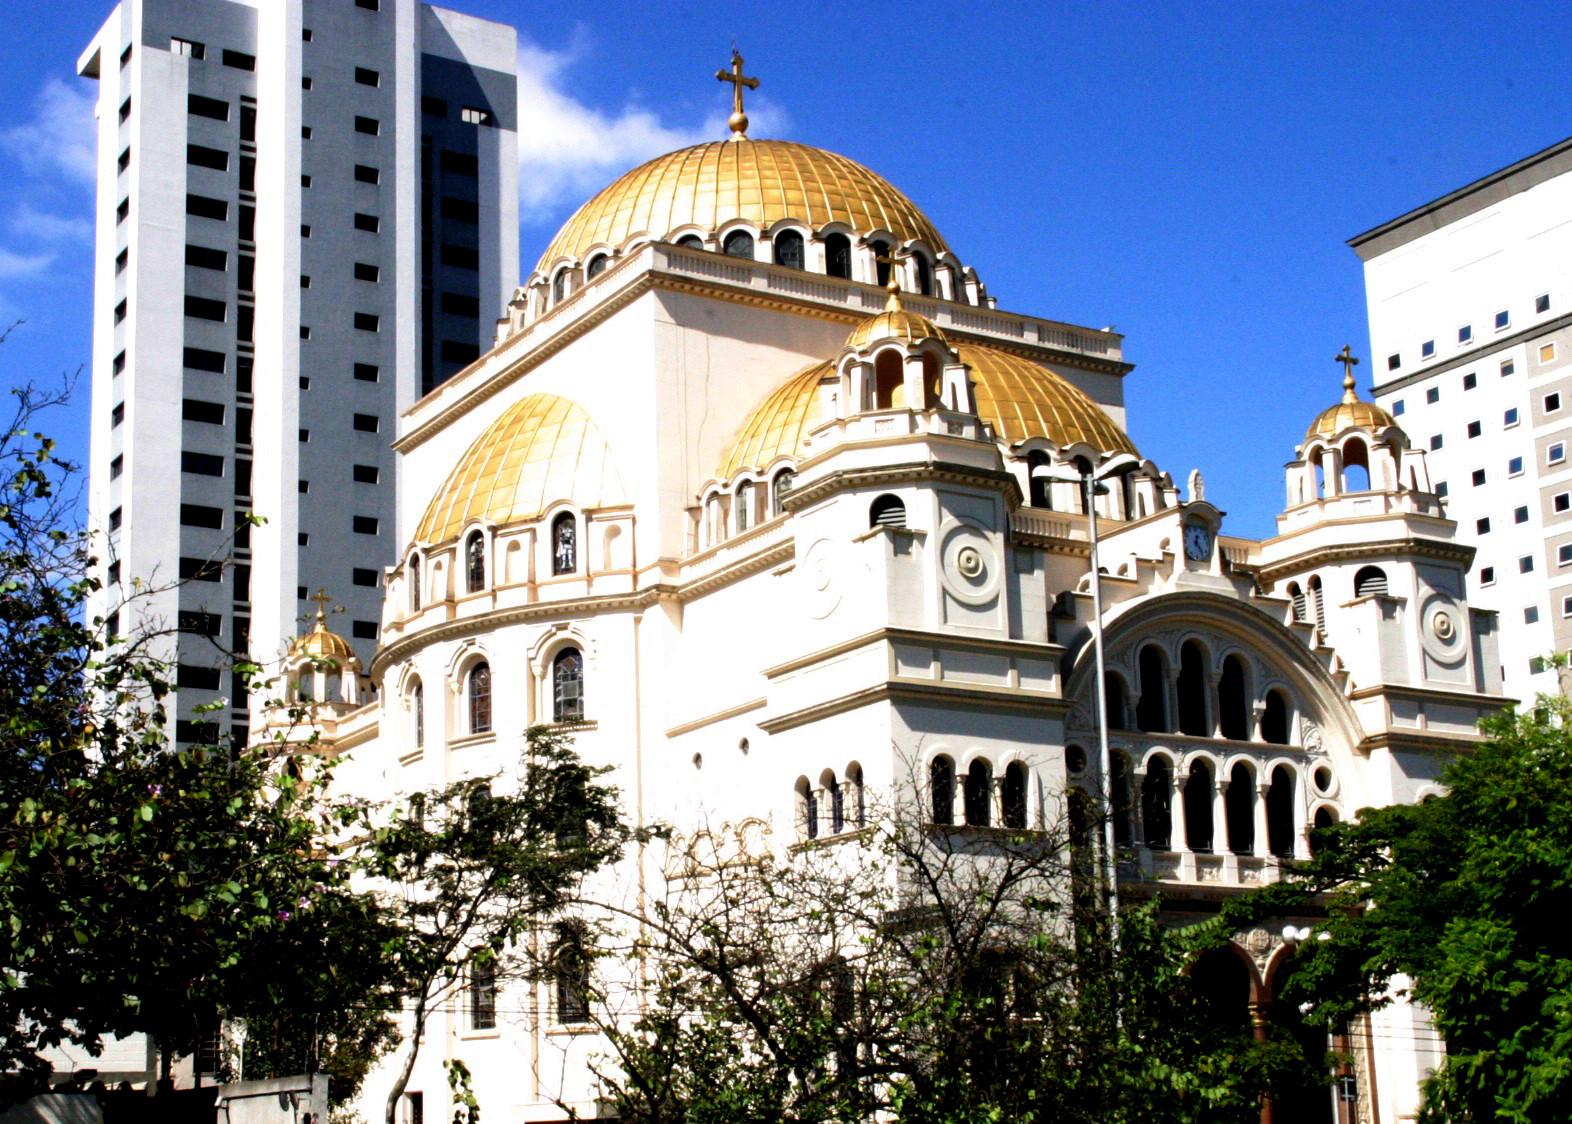 (c) Catedralortodoxa.com.br